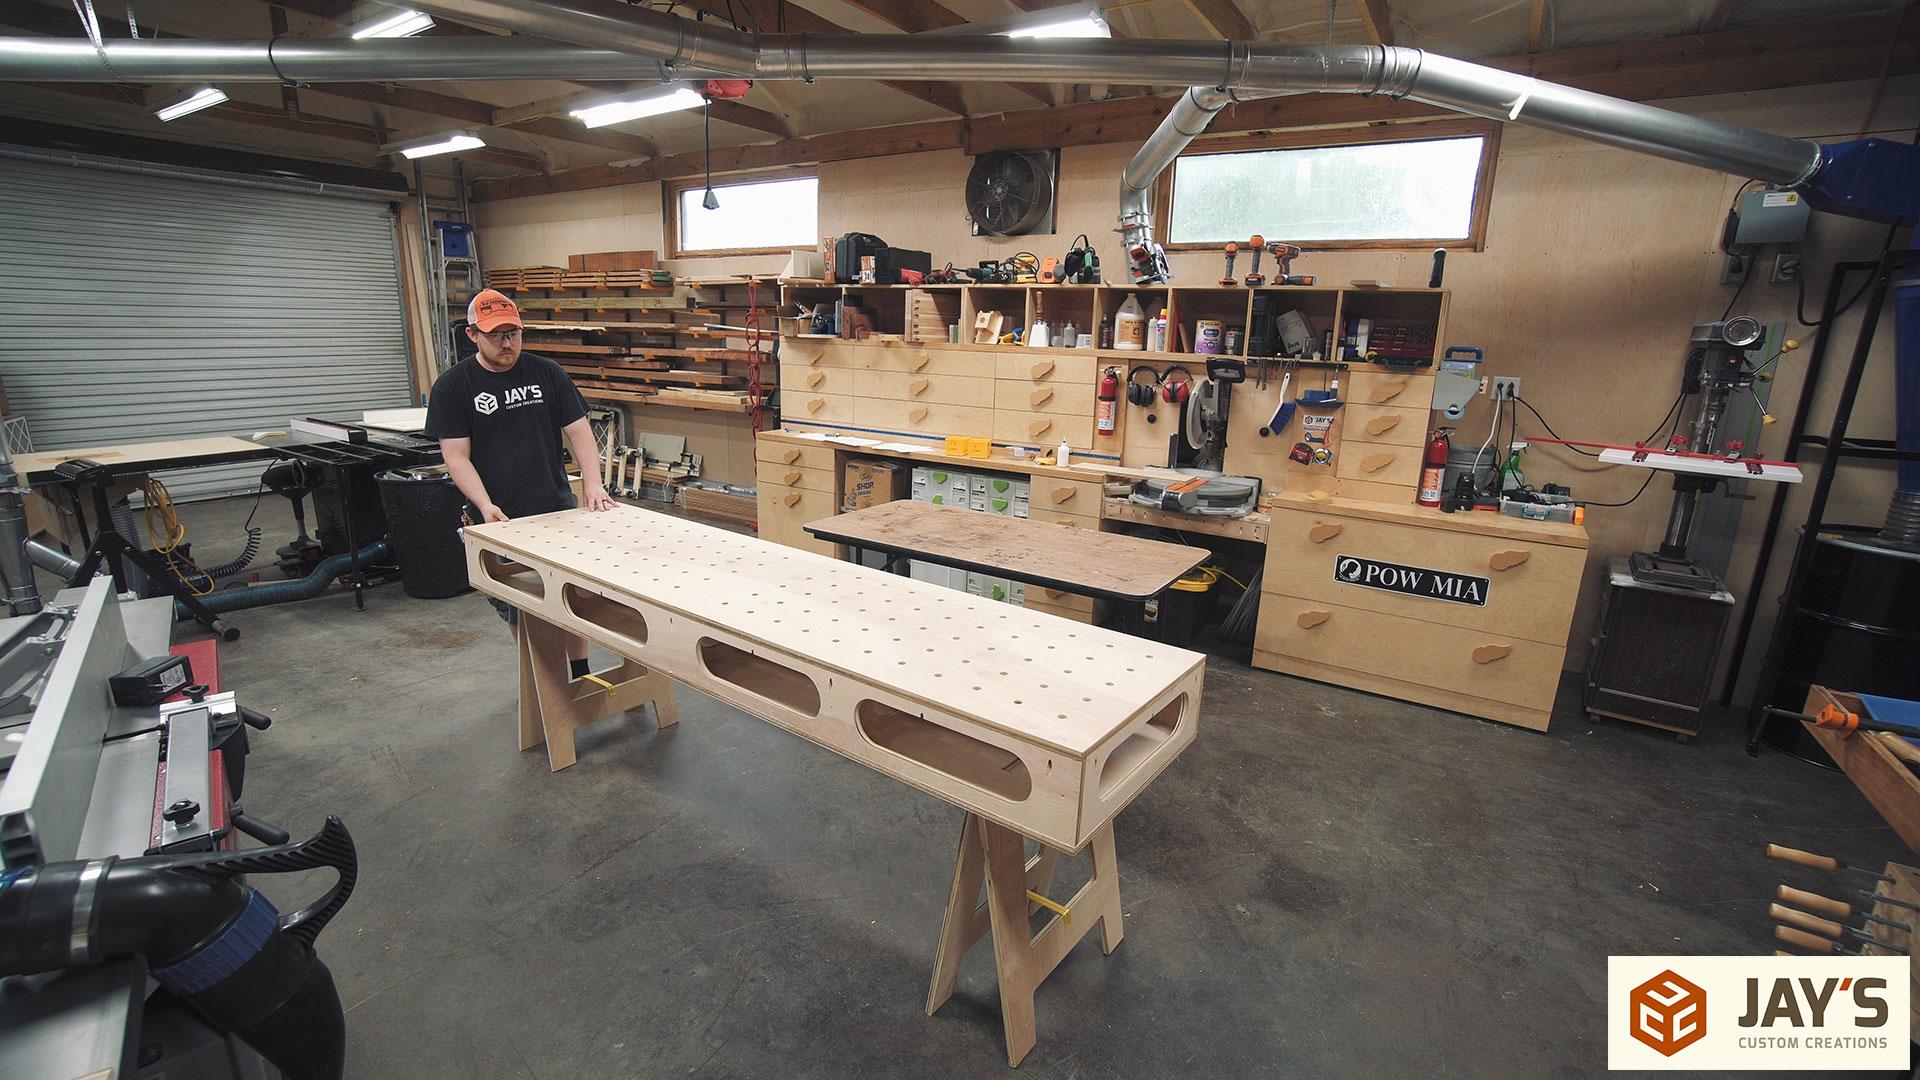 Amazing My Temporary Assembly Table Jays Custom Creations Evergreenethics Interior Chair Design Evergreenethicsorg